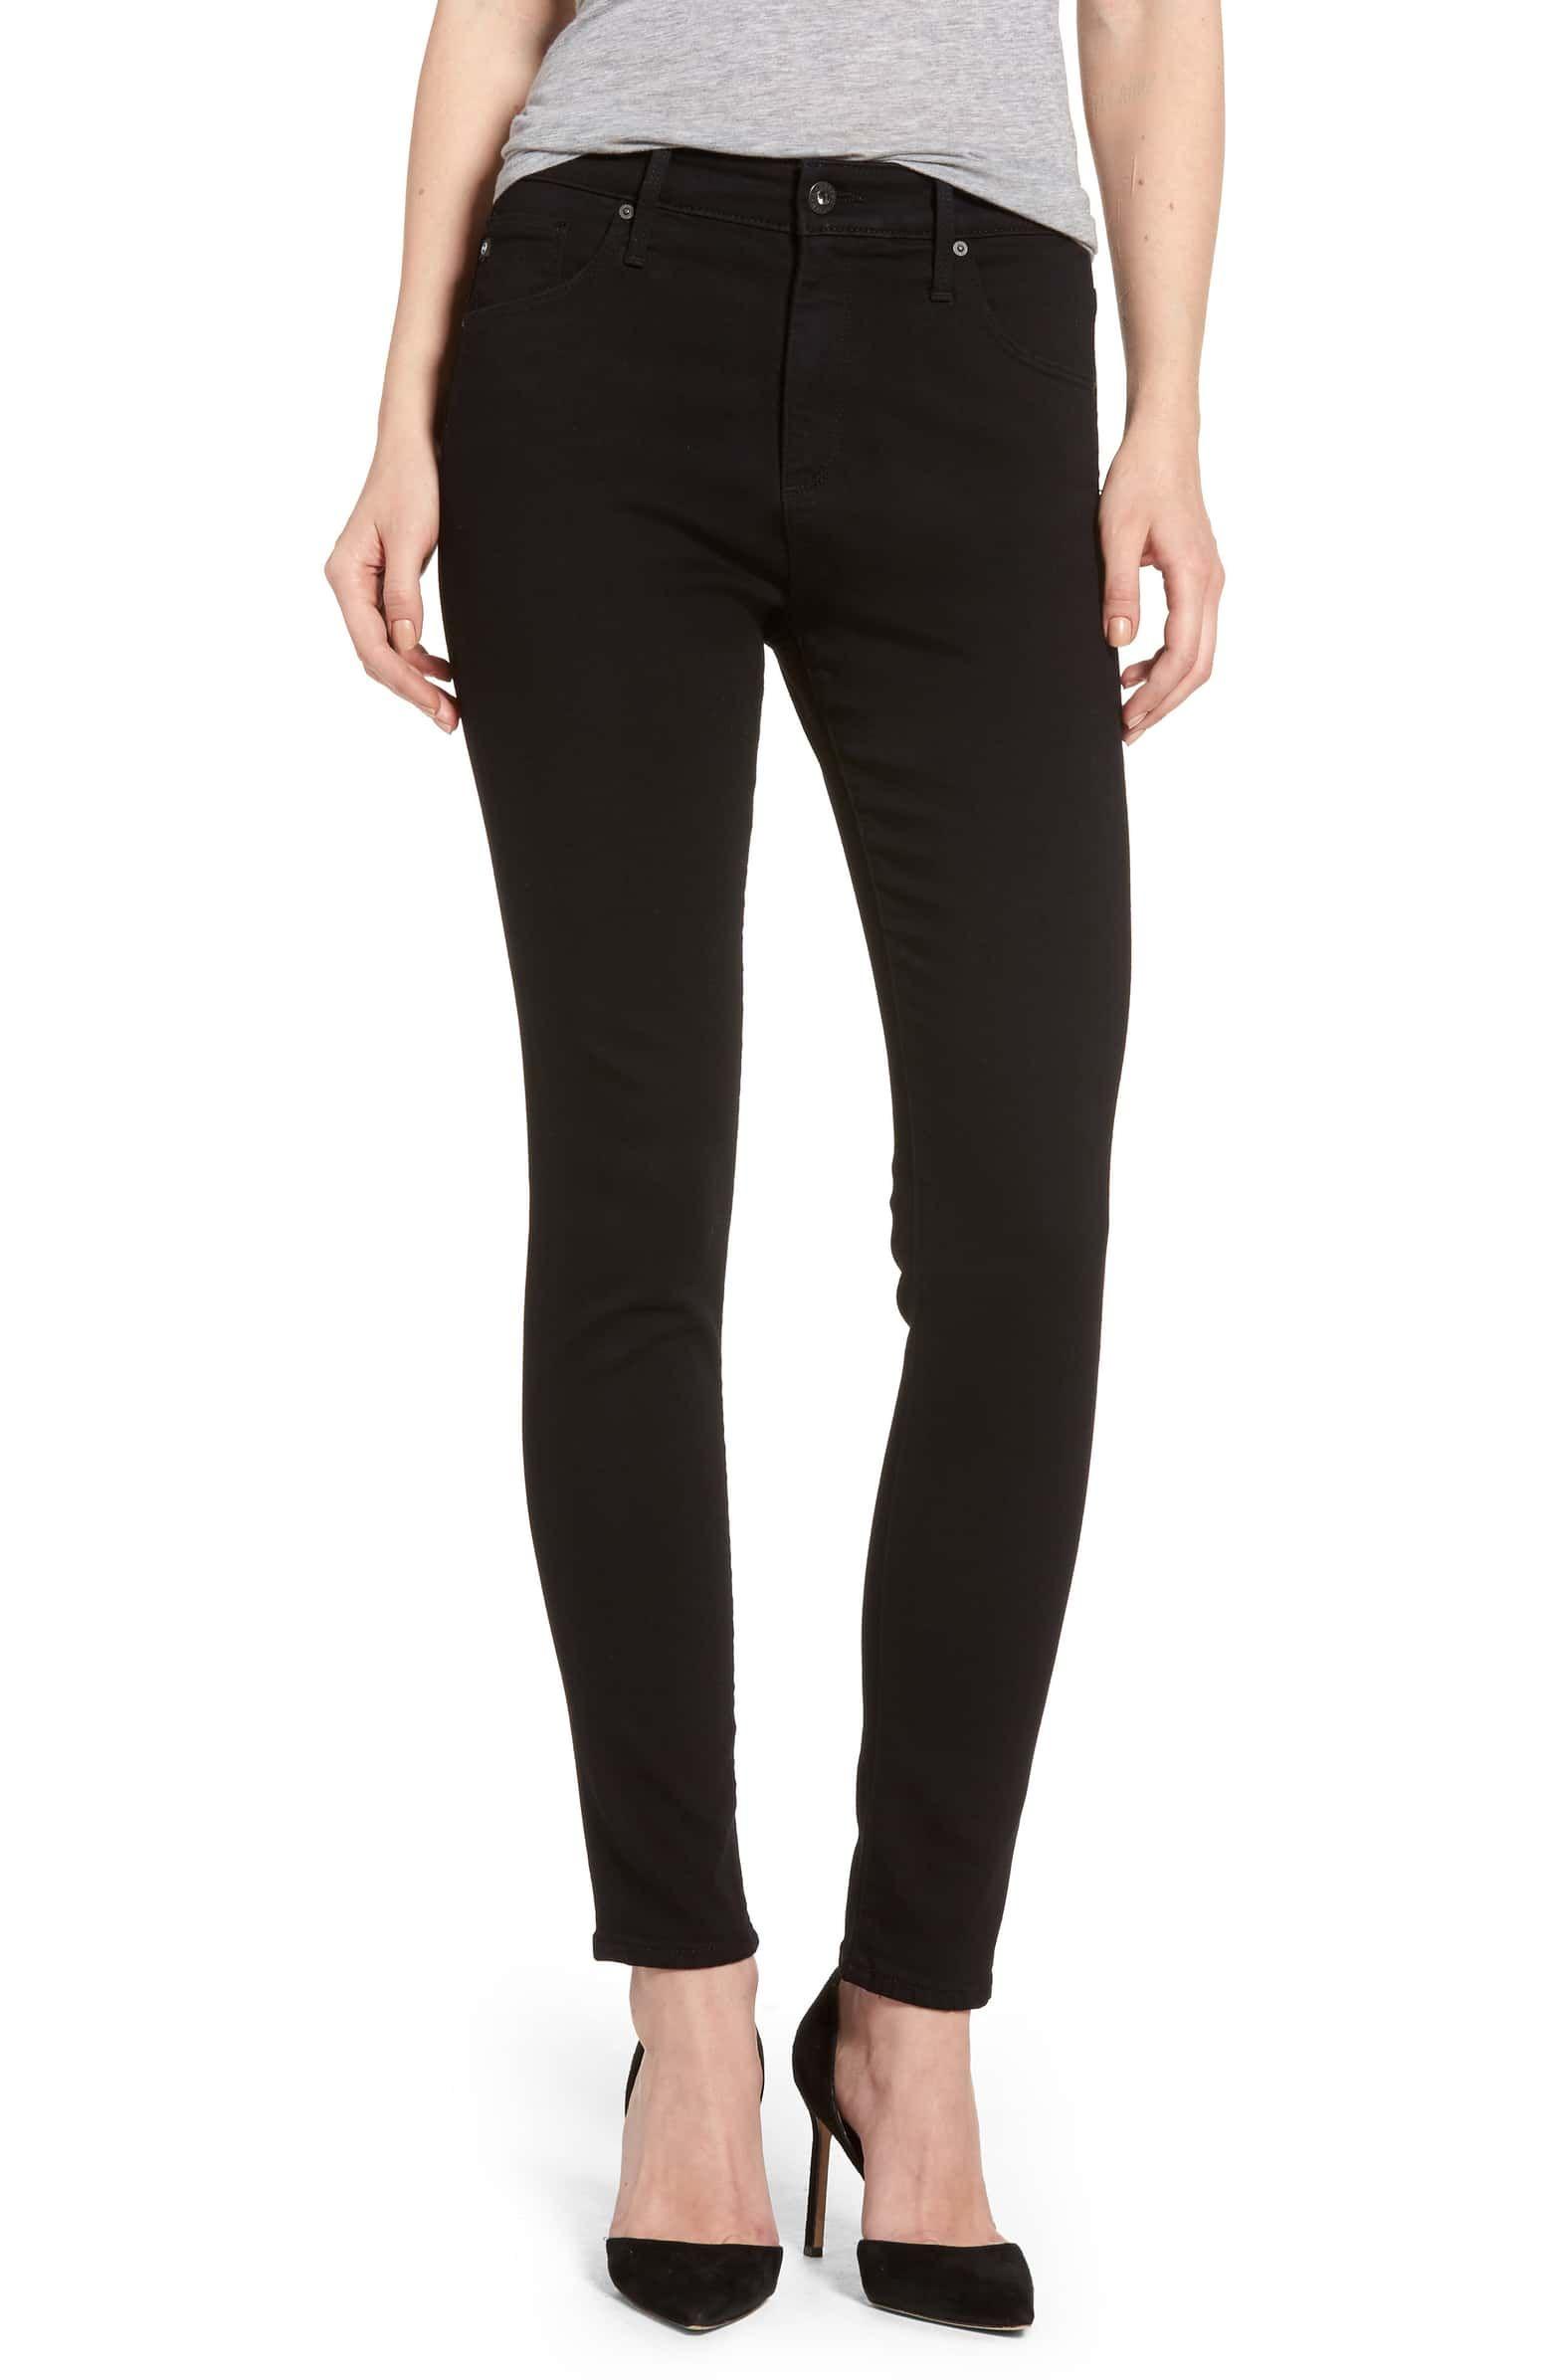 7cd27ee7422f4 a cup of jo - best work pants. Farrah High Waist Ankle Skinny Jeans, Main,  color, Super Black Velvet Leggings,. Visit